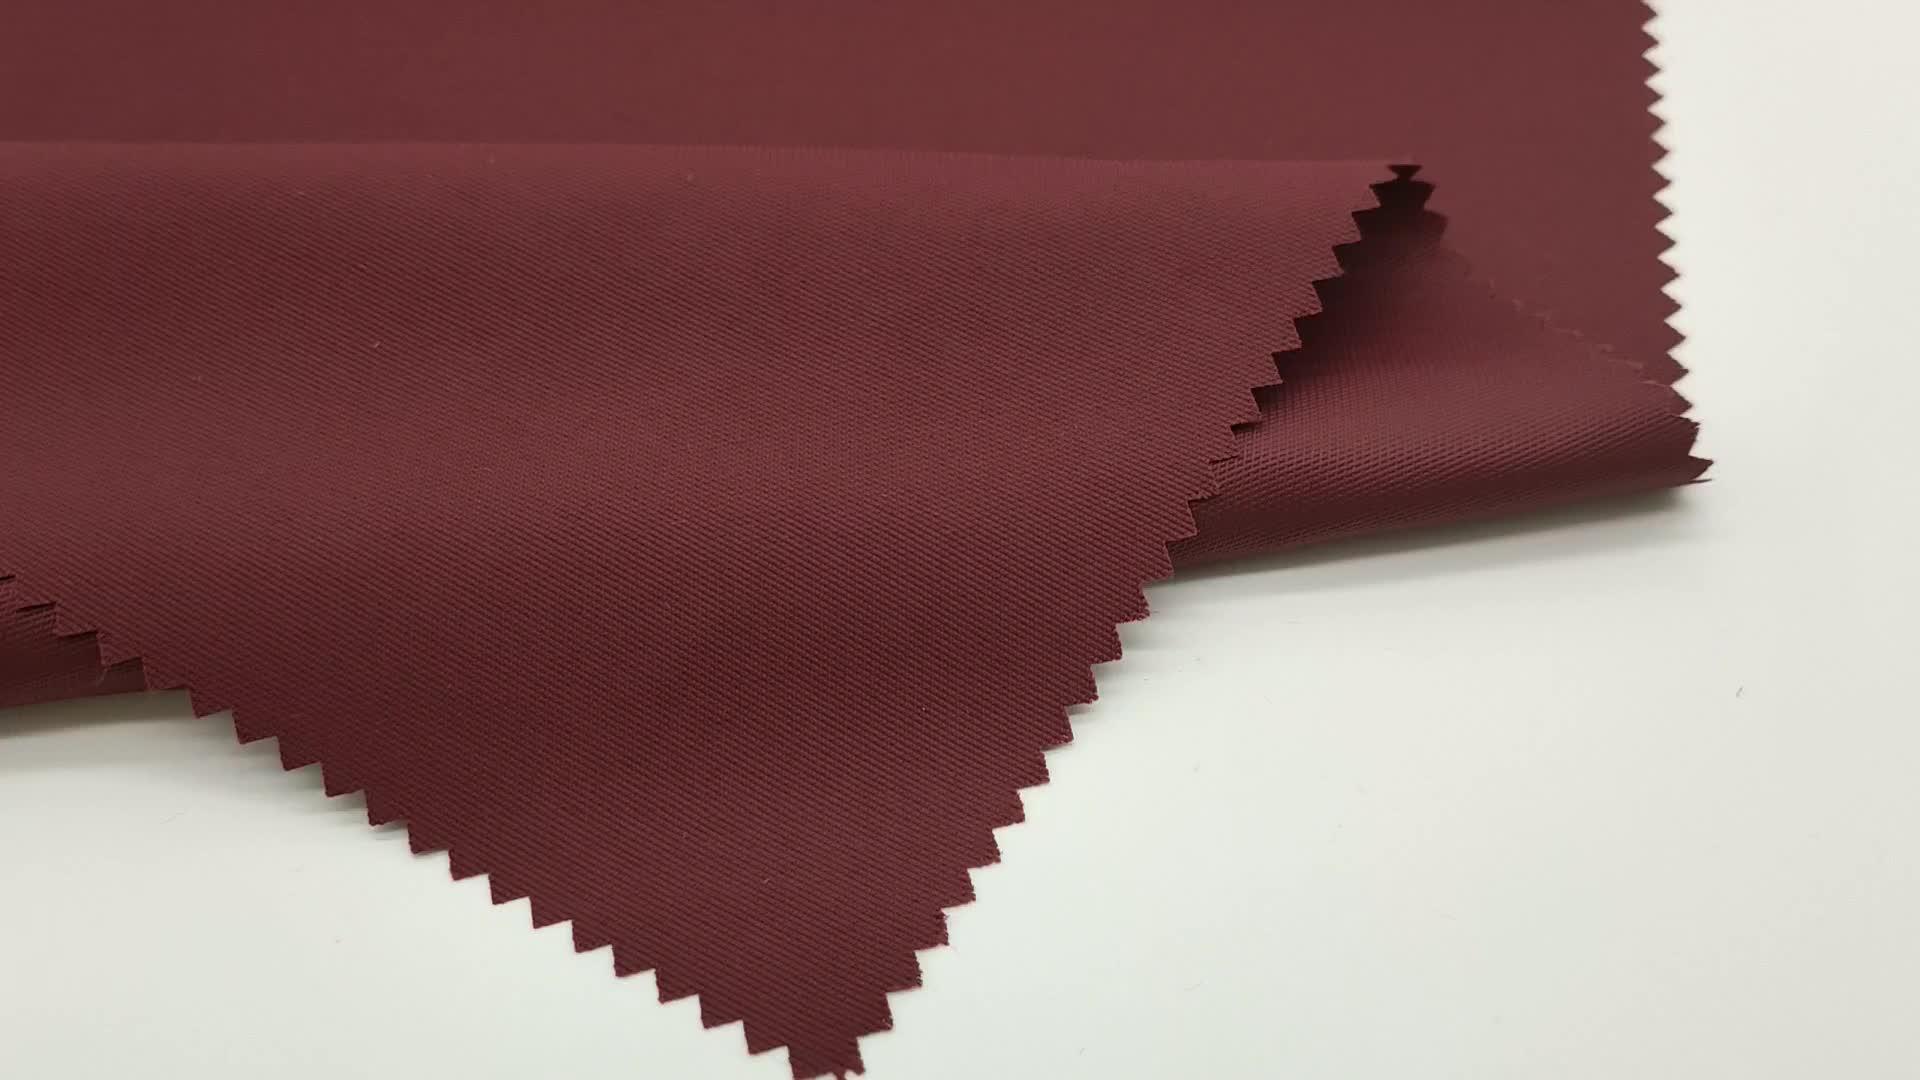 Professional hot sale 100%nylon twill taslon different types nylon fabrics comfortable waterproof breathable fabrics